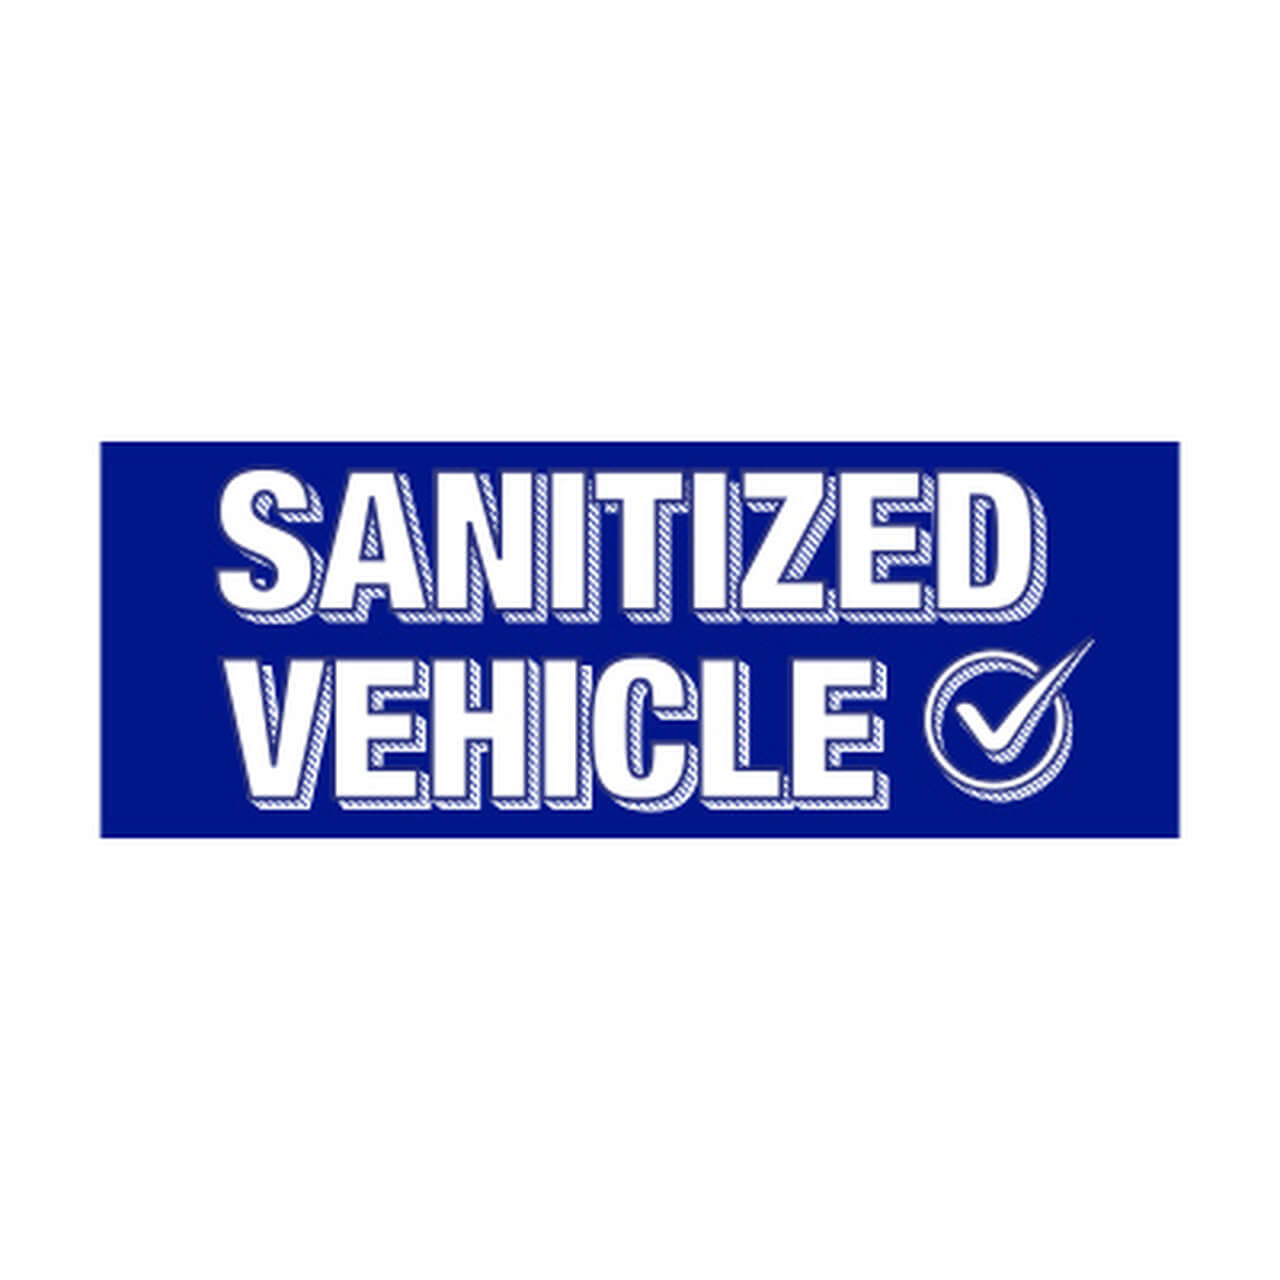 NEW Windshield Slogan - Sanitized Vehicle - Large Blue and White Decal